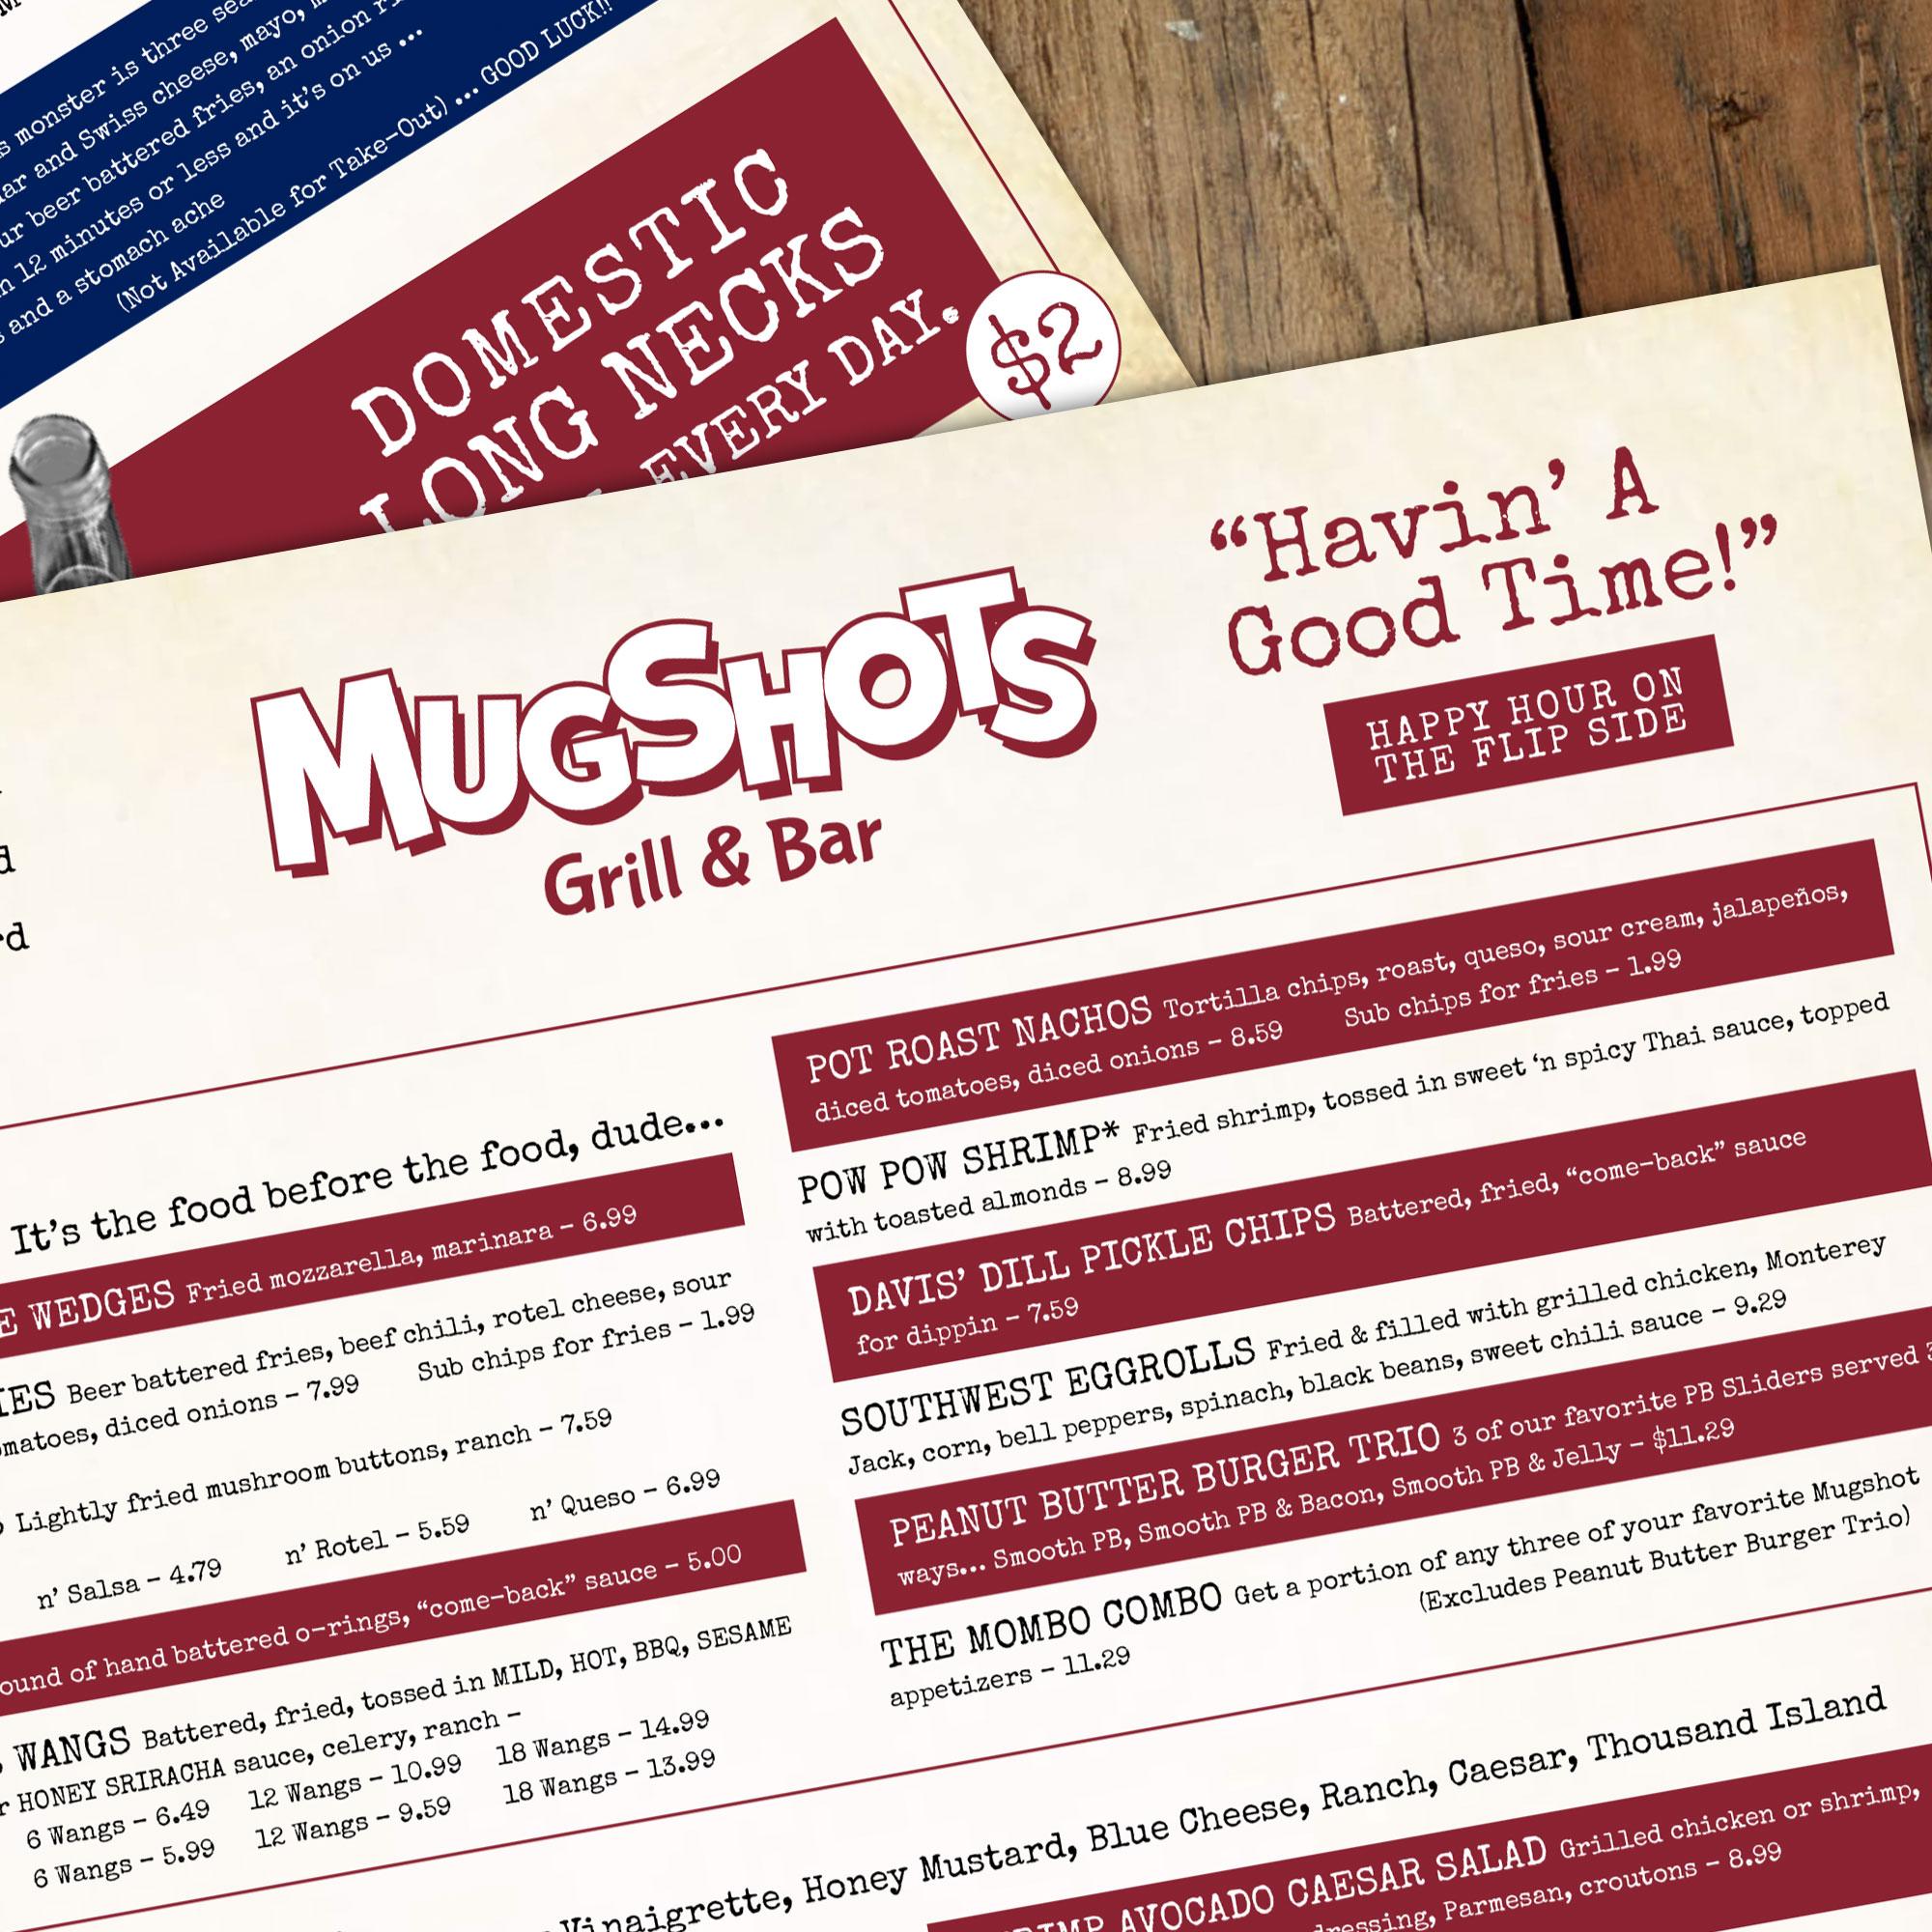 Menu Design: Mugshots Grill & Bar